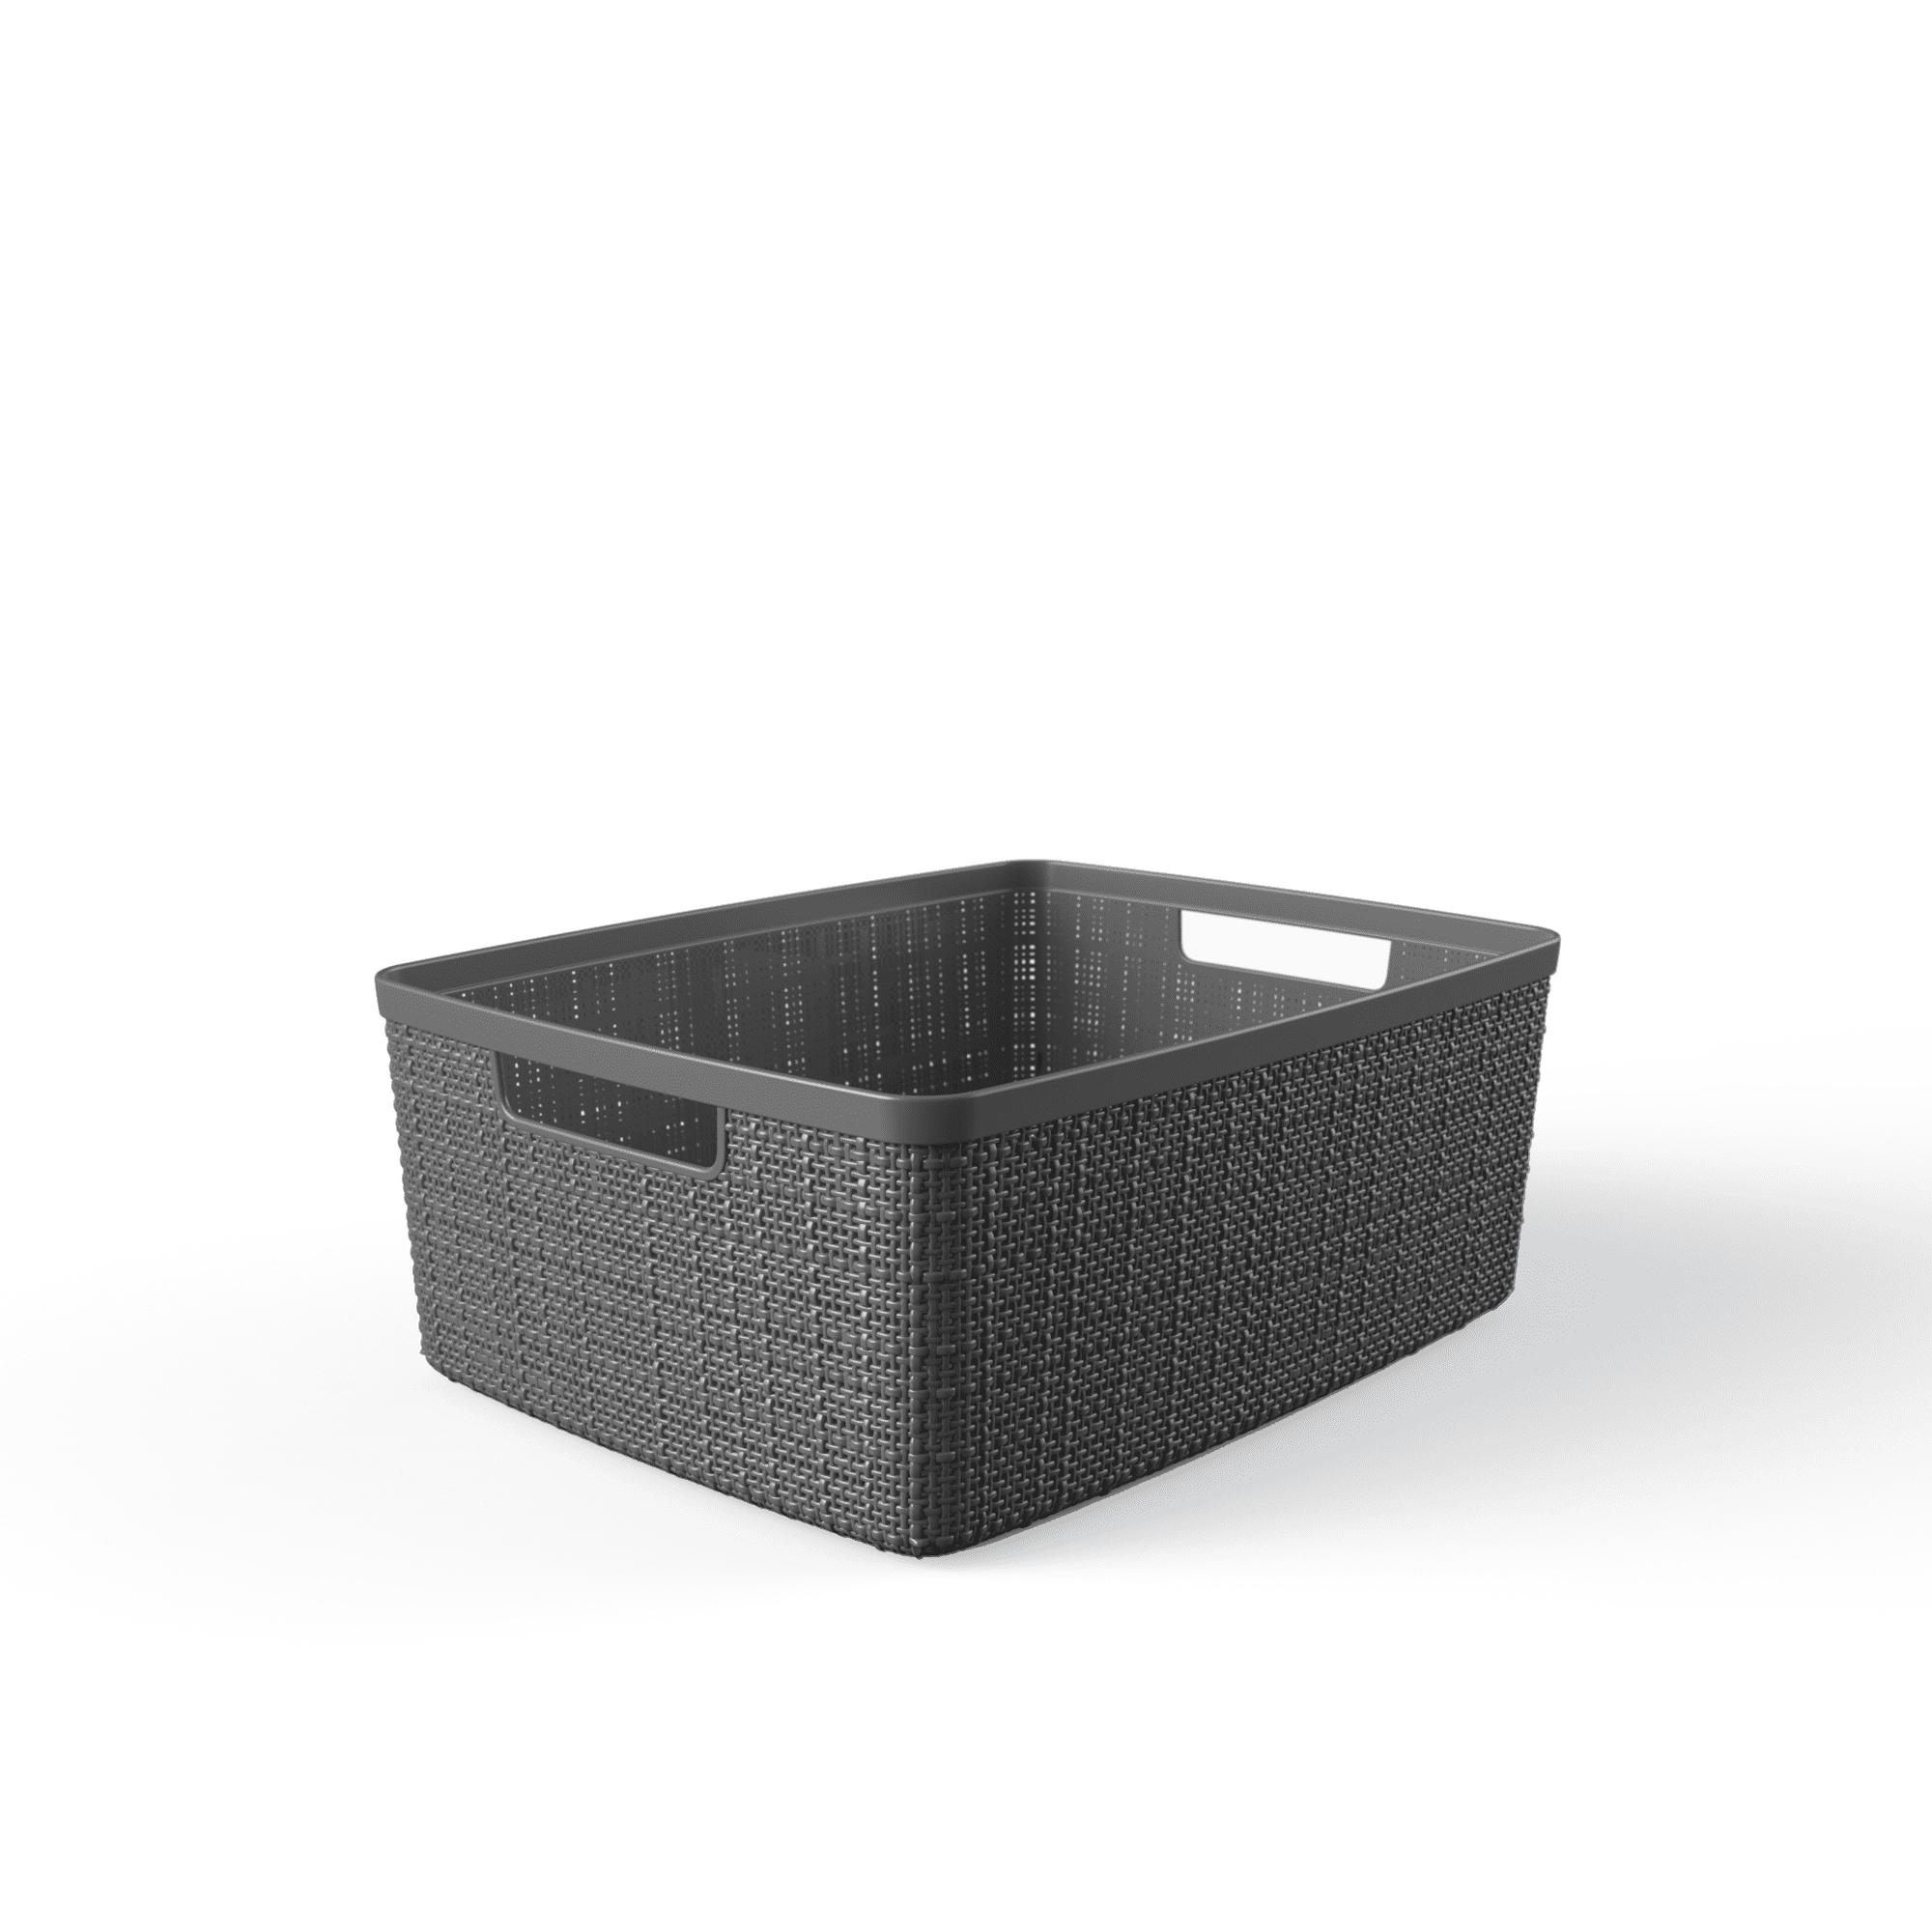 Black Inhouse Plastic Curver Storage Basket Medium for Kitchen 6 Packs